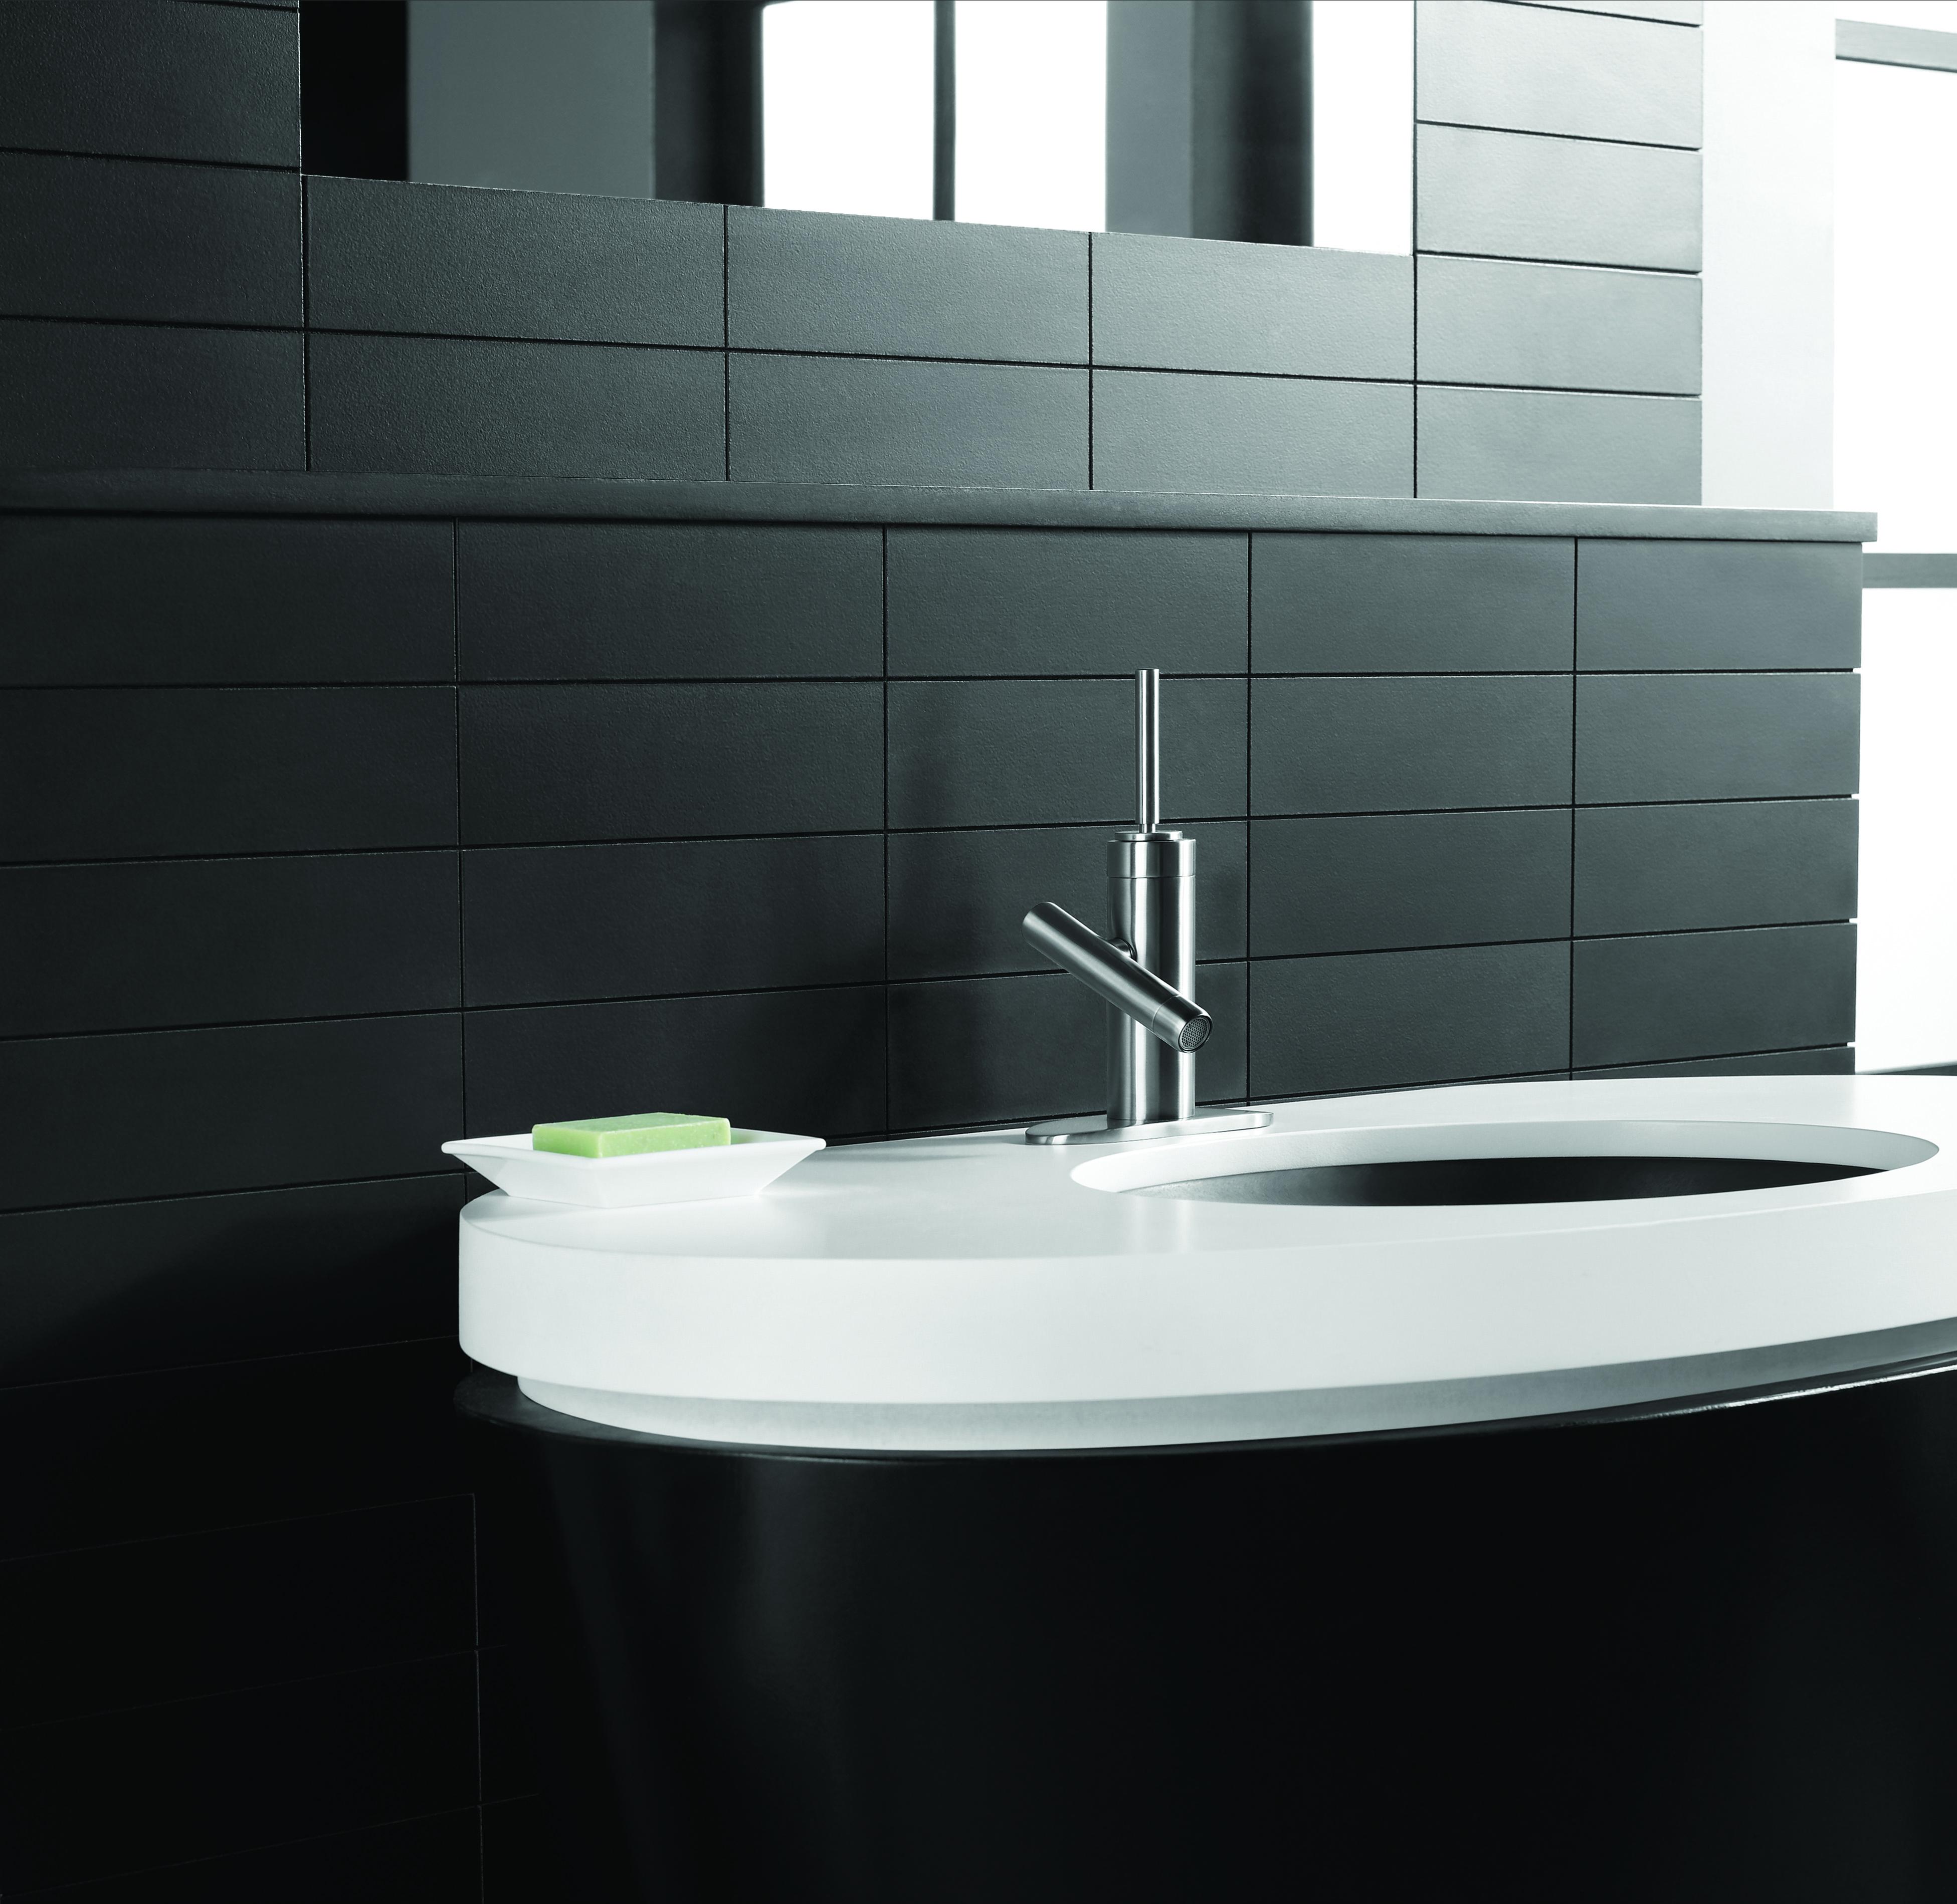 Price Pfister Debuts Ultra-Modern Contempra Bath Faucet